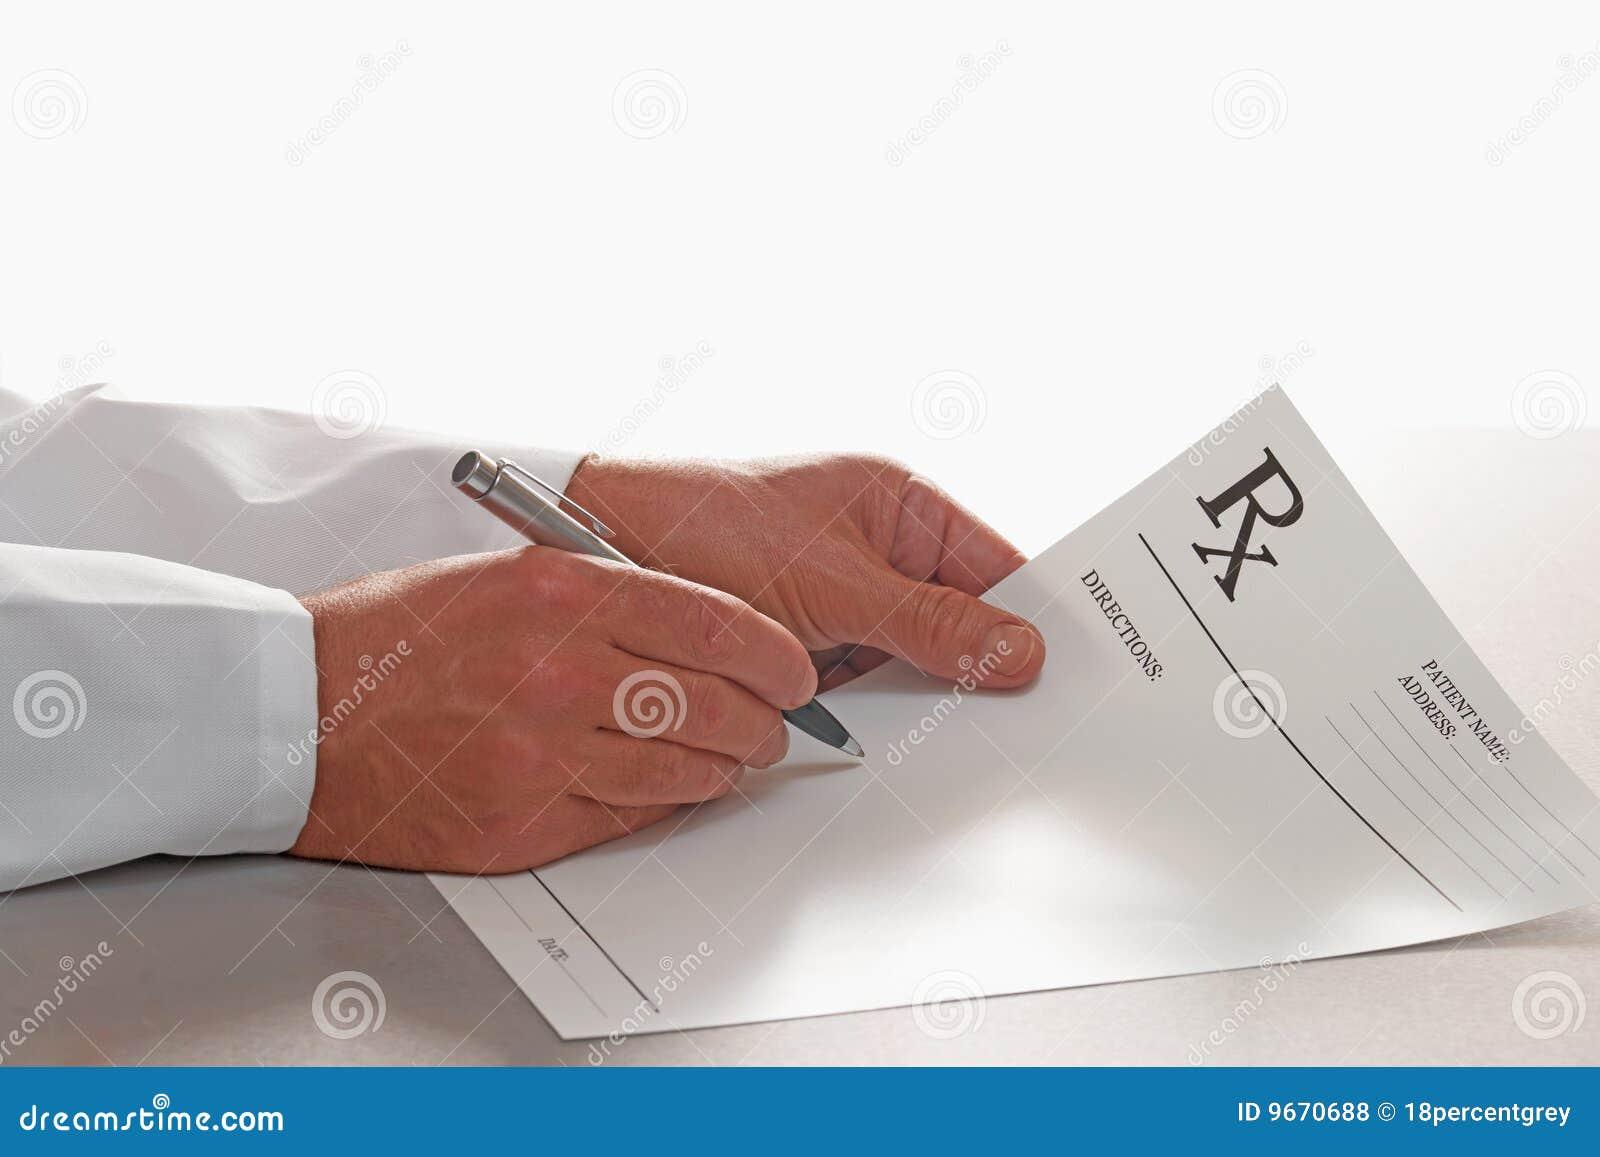 doctor write a prescription online